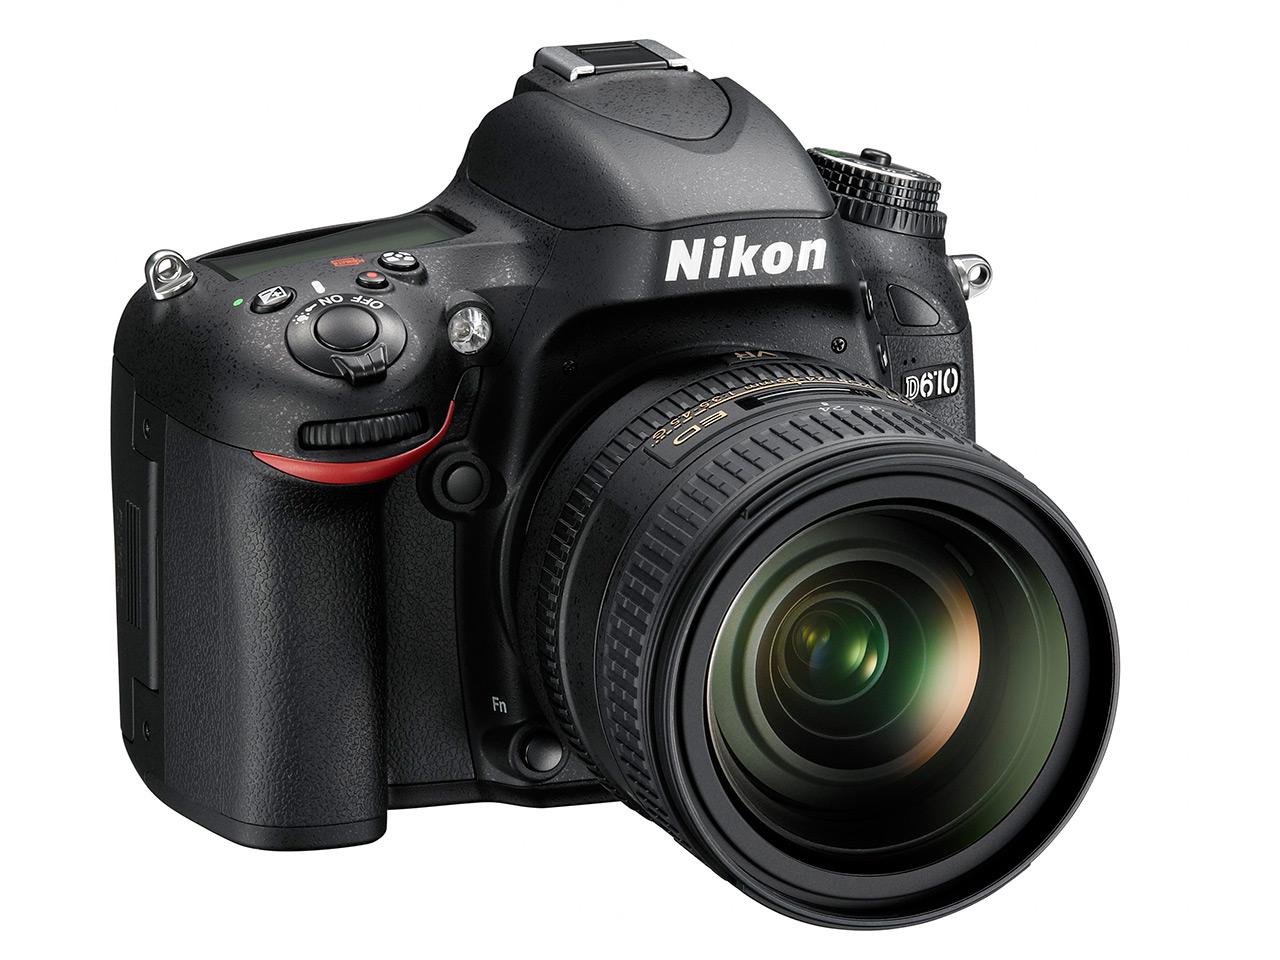 Bemutatták a Nikon D610 DSLR-t